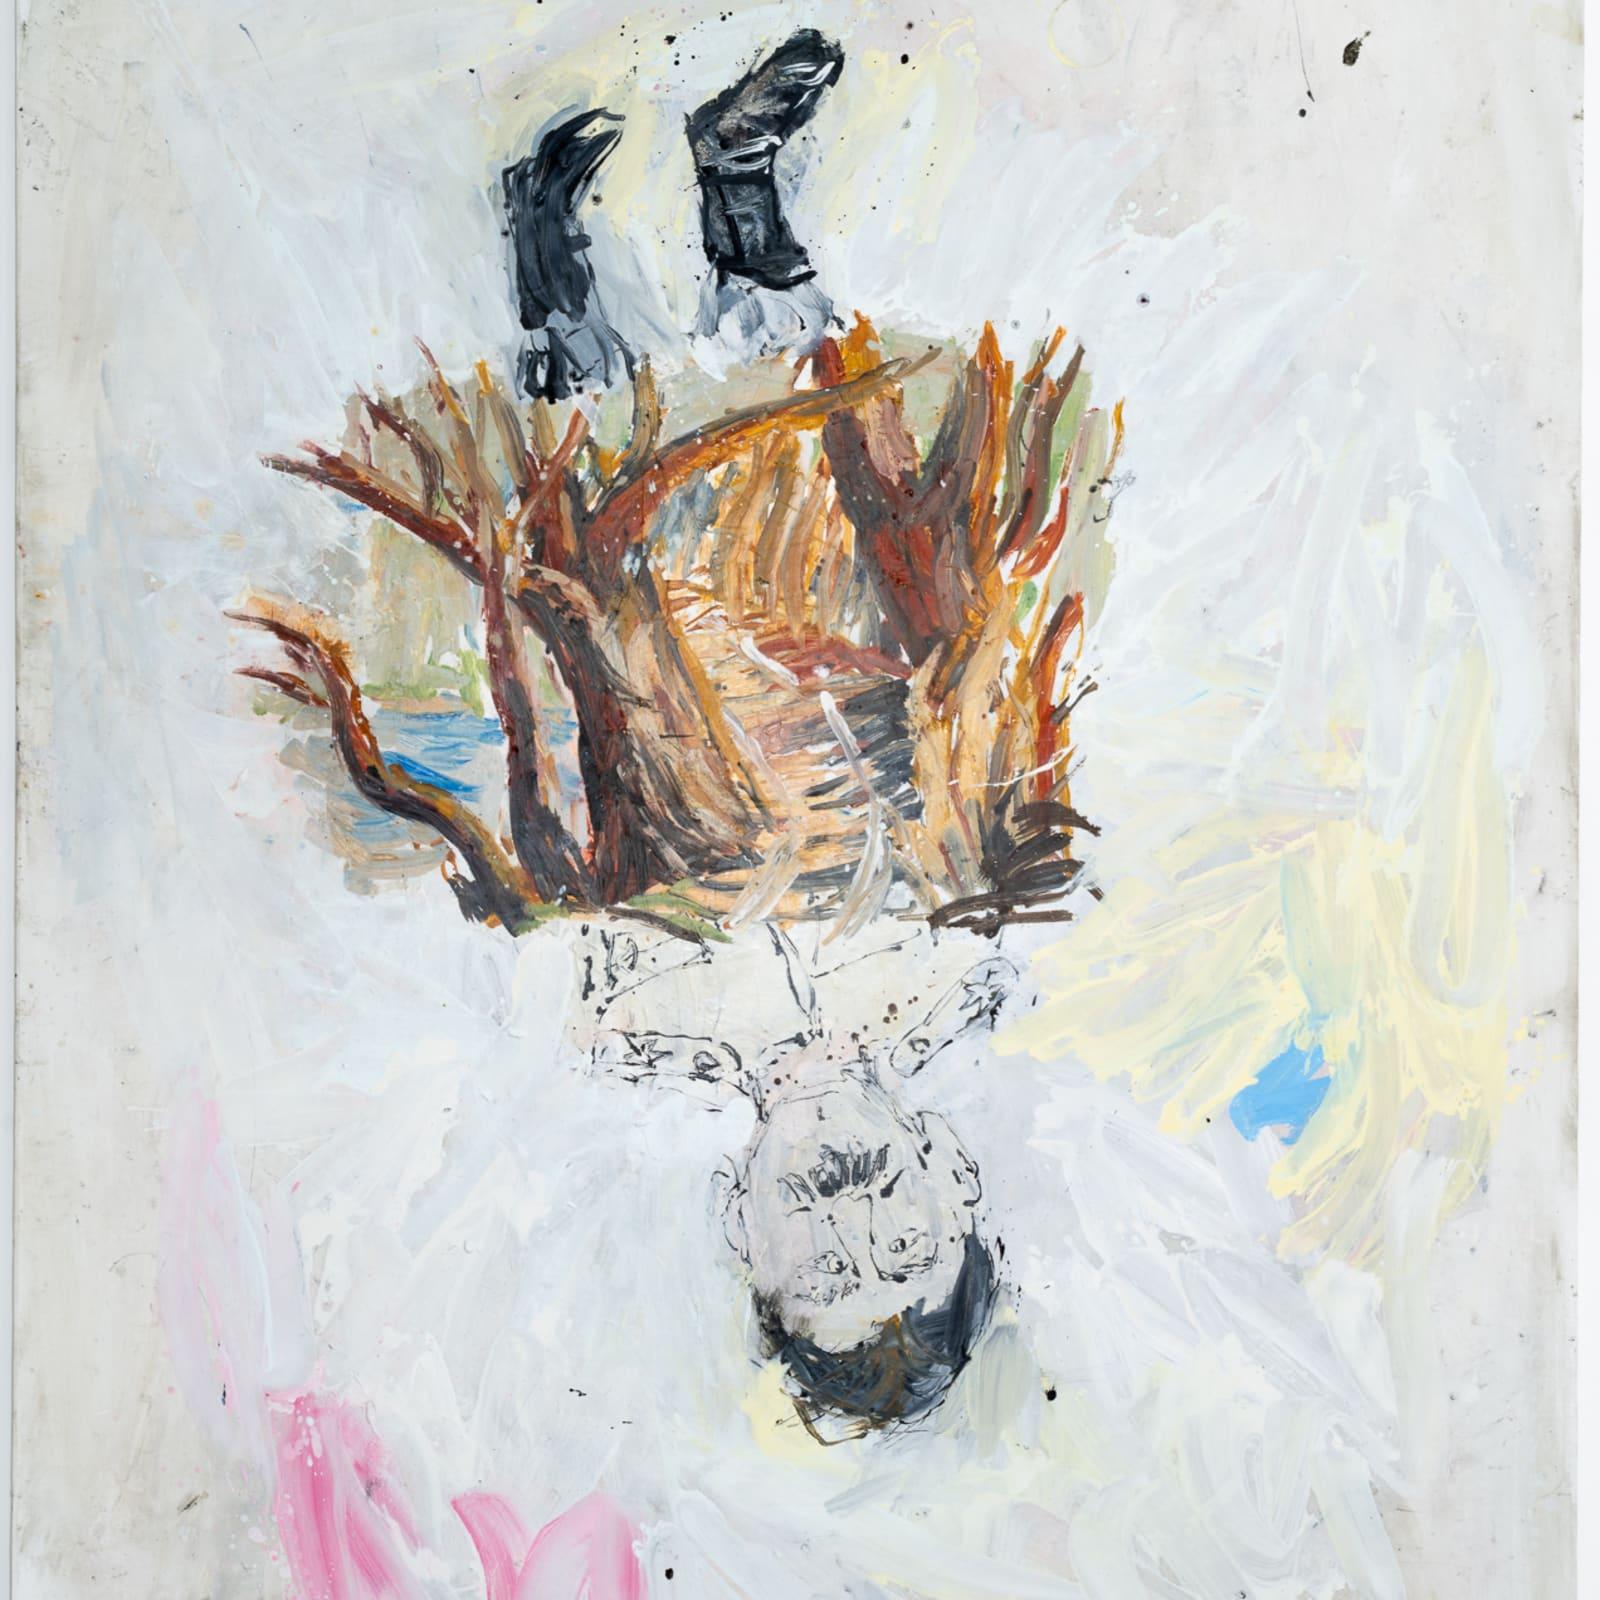 Georg Baselitz, 1953, 2001-2002